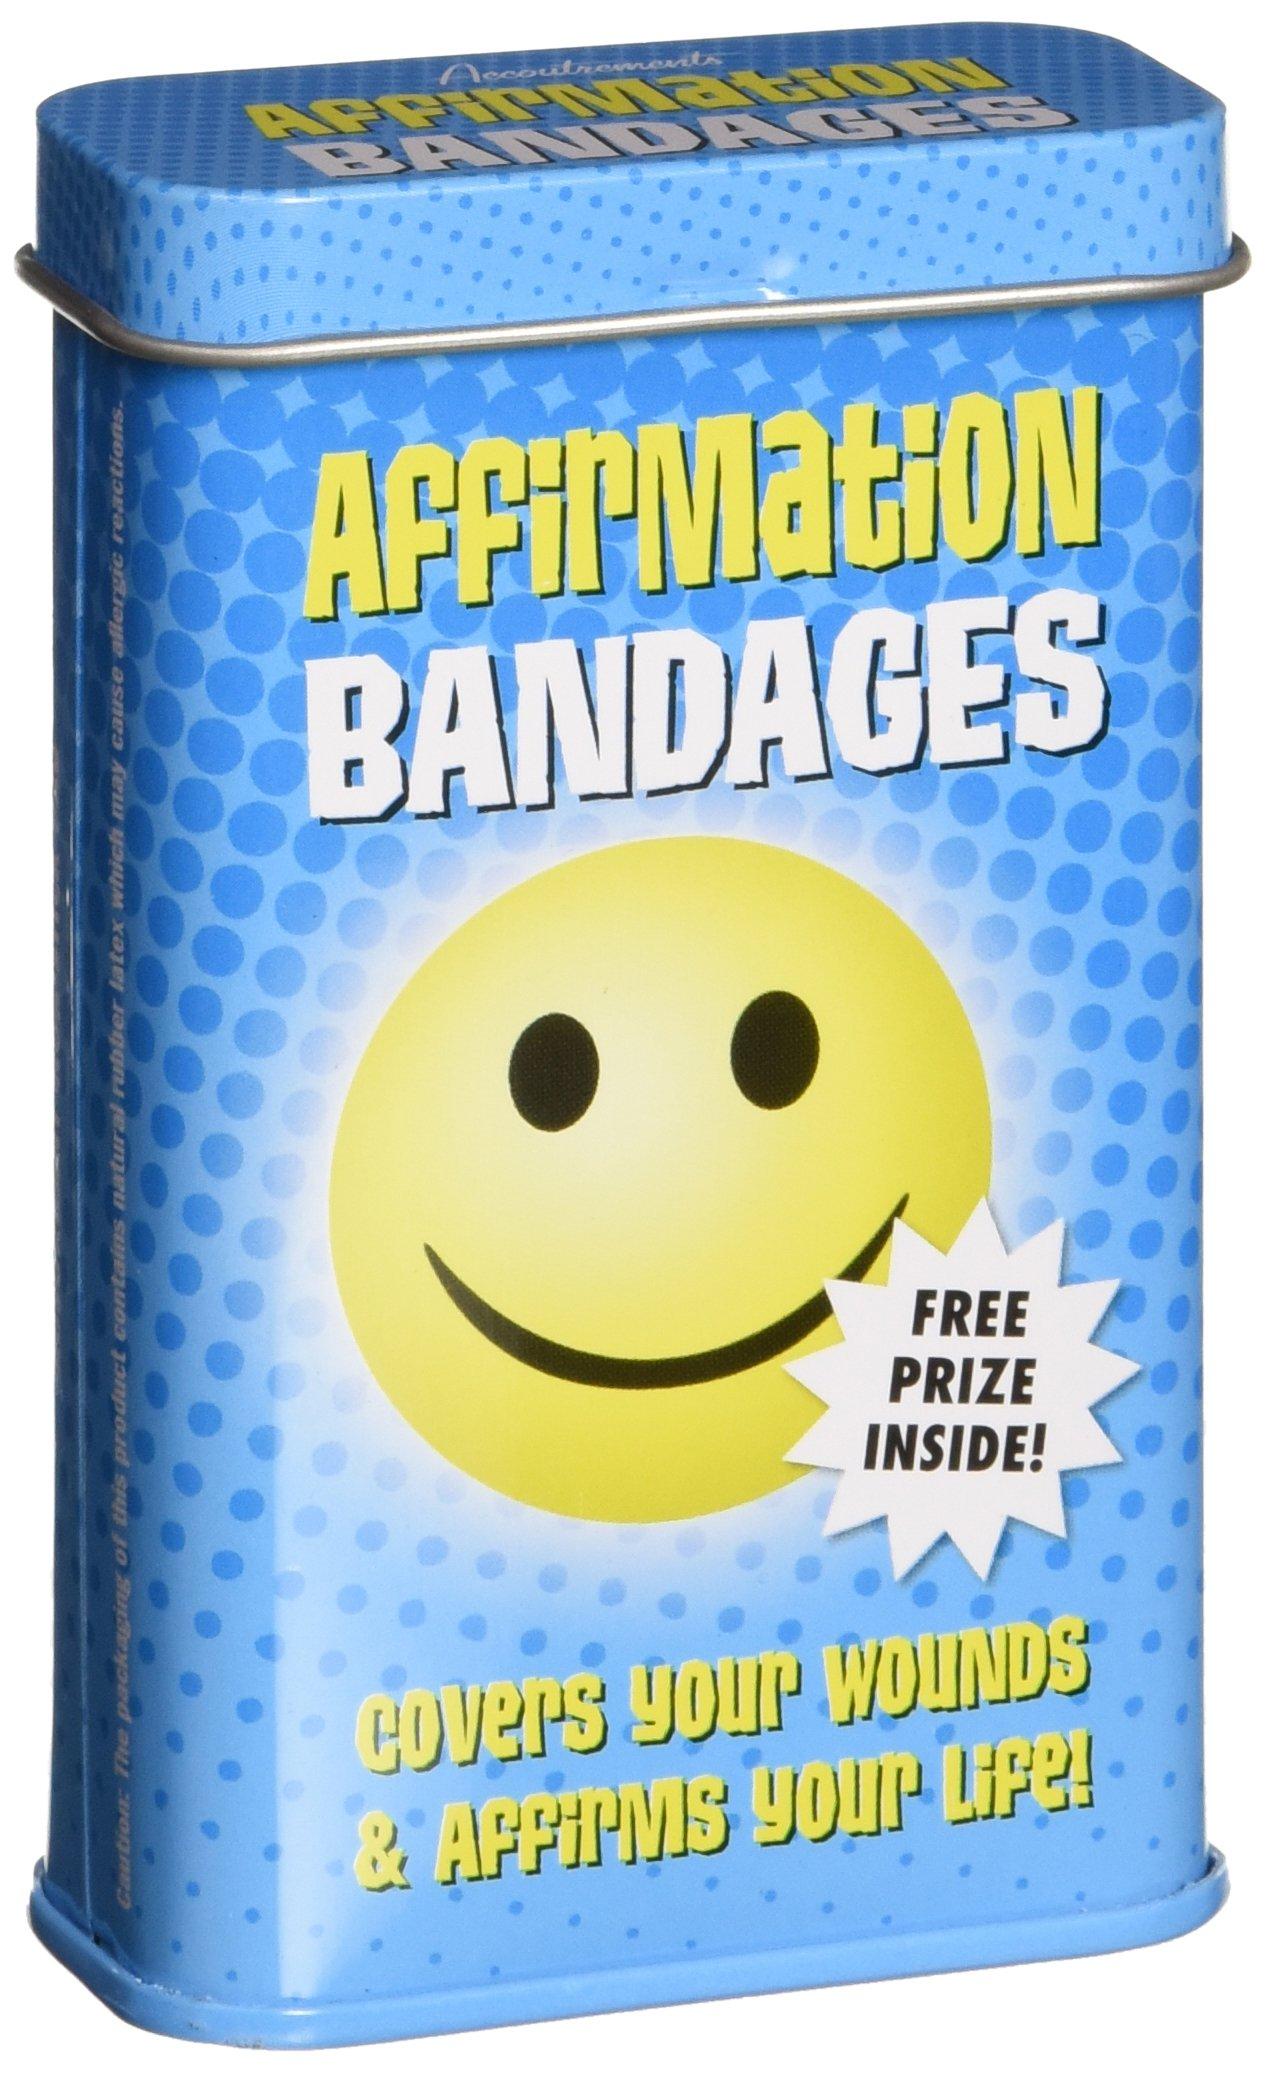 Accoutrements Affirmation Bandages